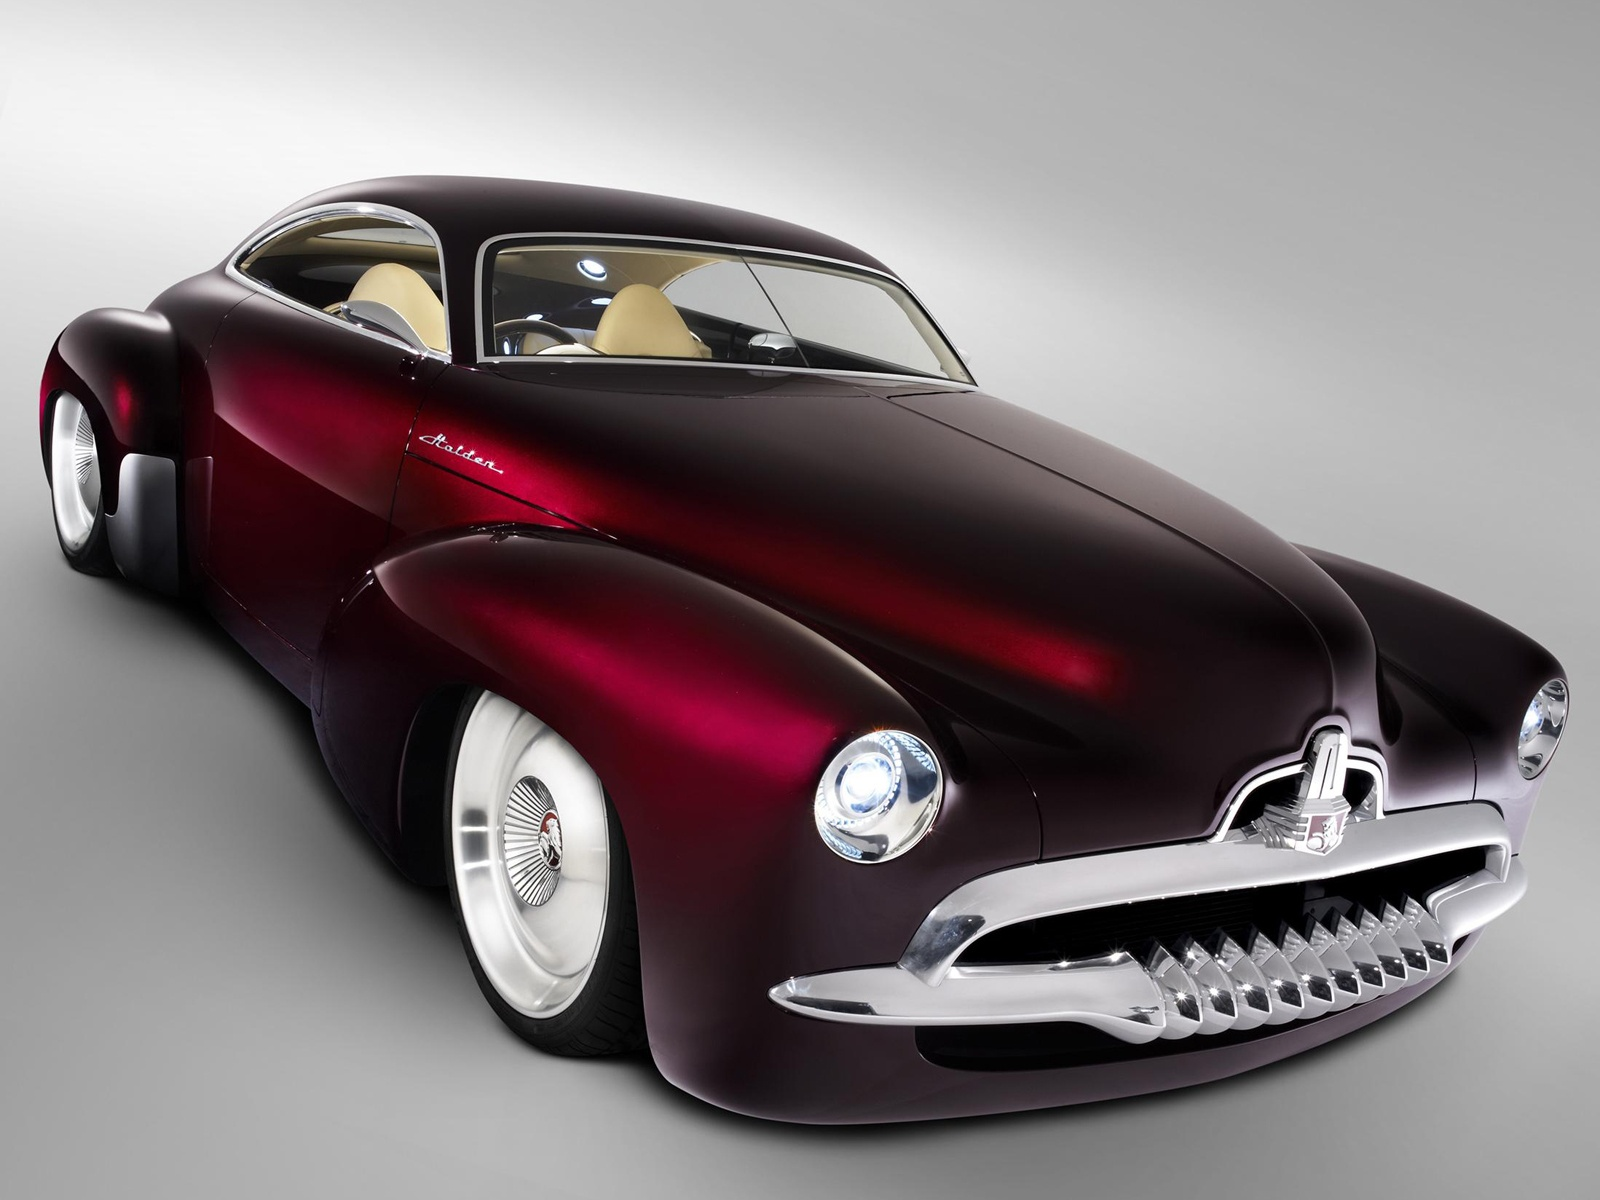 ... Free Download HD 2013: Classic Car Wallpapers Free Wallpaper Pics